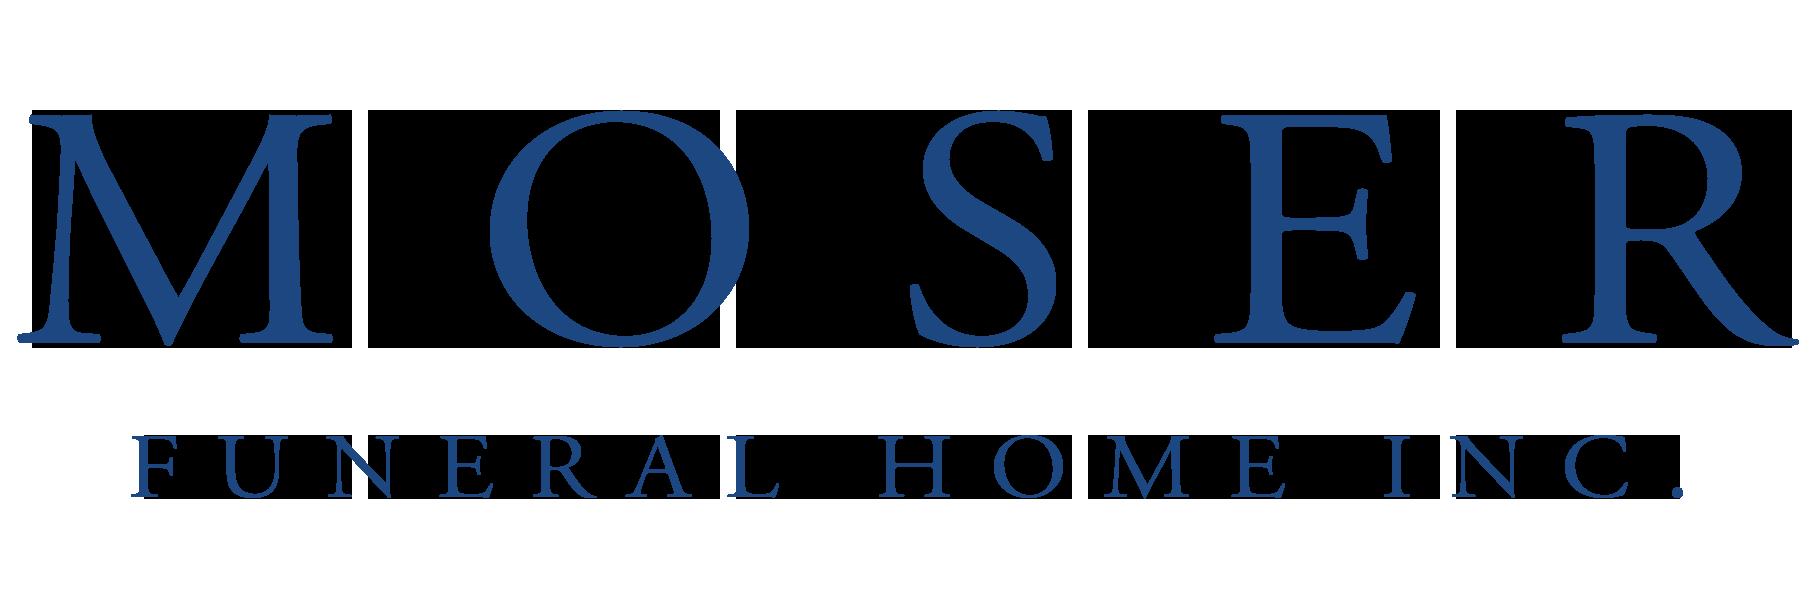 Warrenton, VA Funeral Home & Cremation | Moser Funeral Home Inc